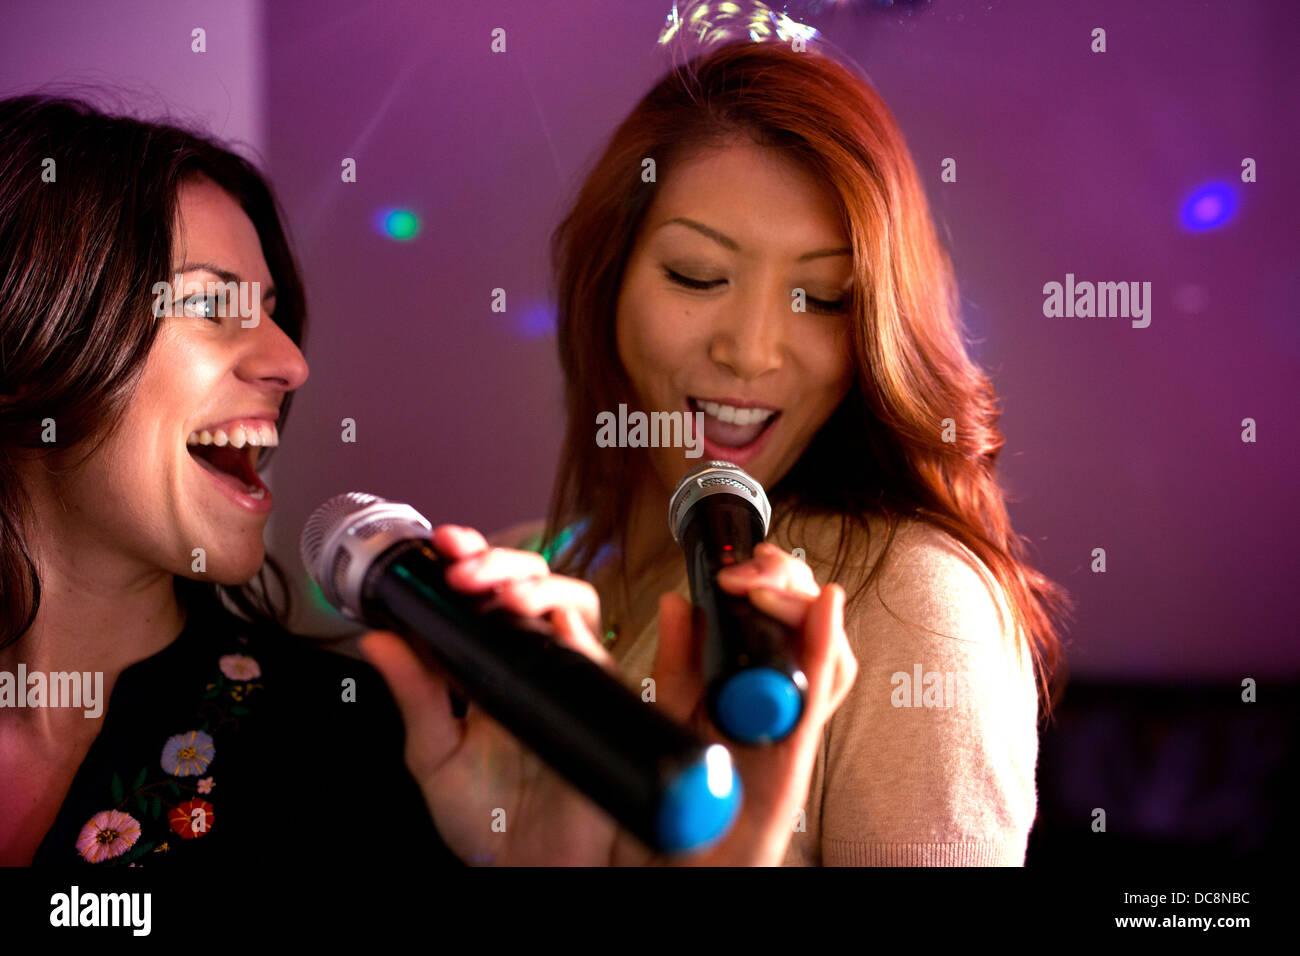 Zwei Frauen singen Karaoke. Stockbild